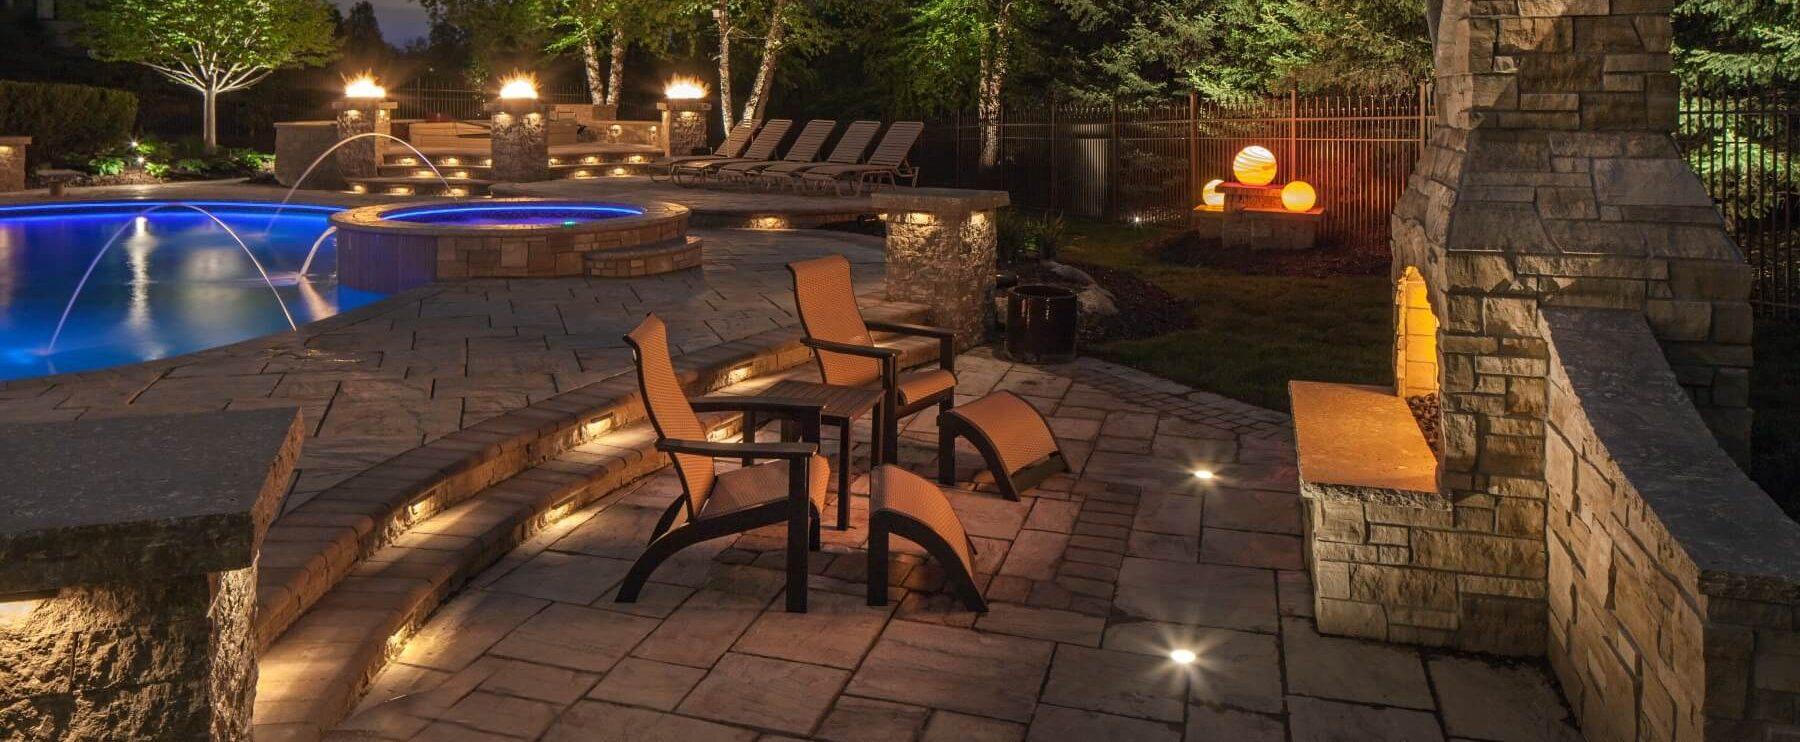 Outdoor Landscape Lighting Ideas U0026 Inspiration